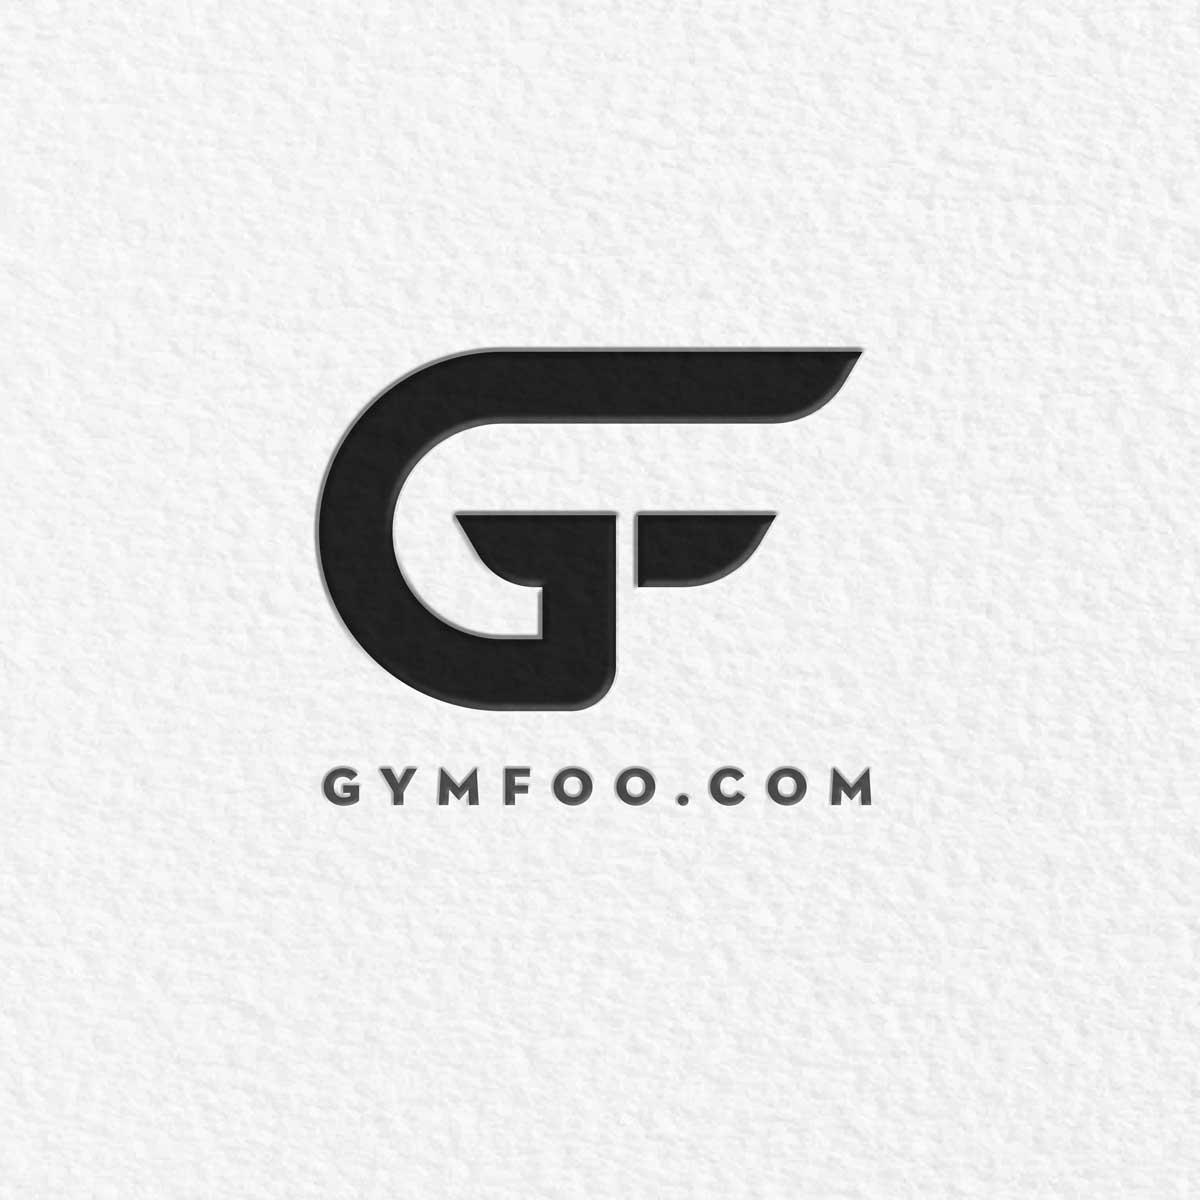 Gymfoo - Branding logo design by Brandizle